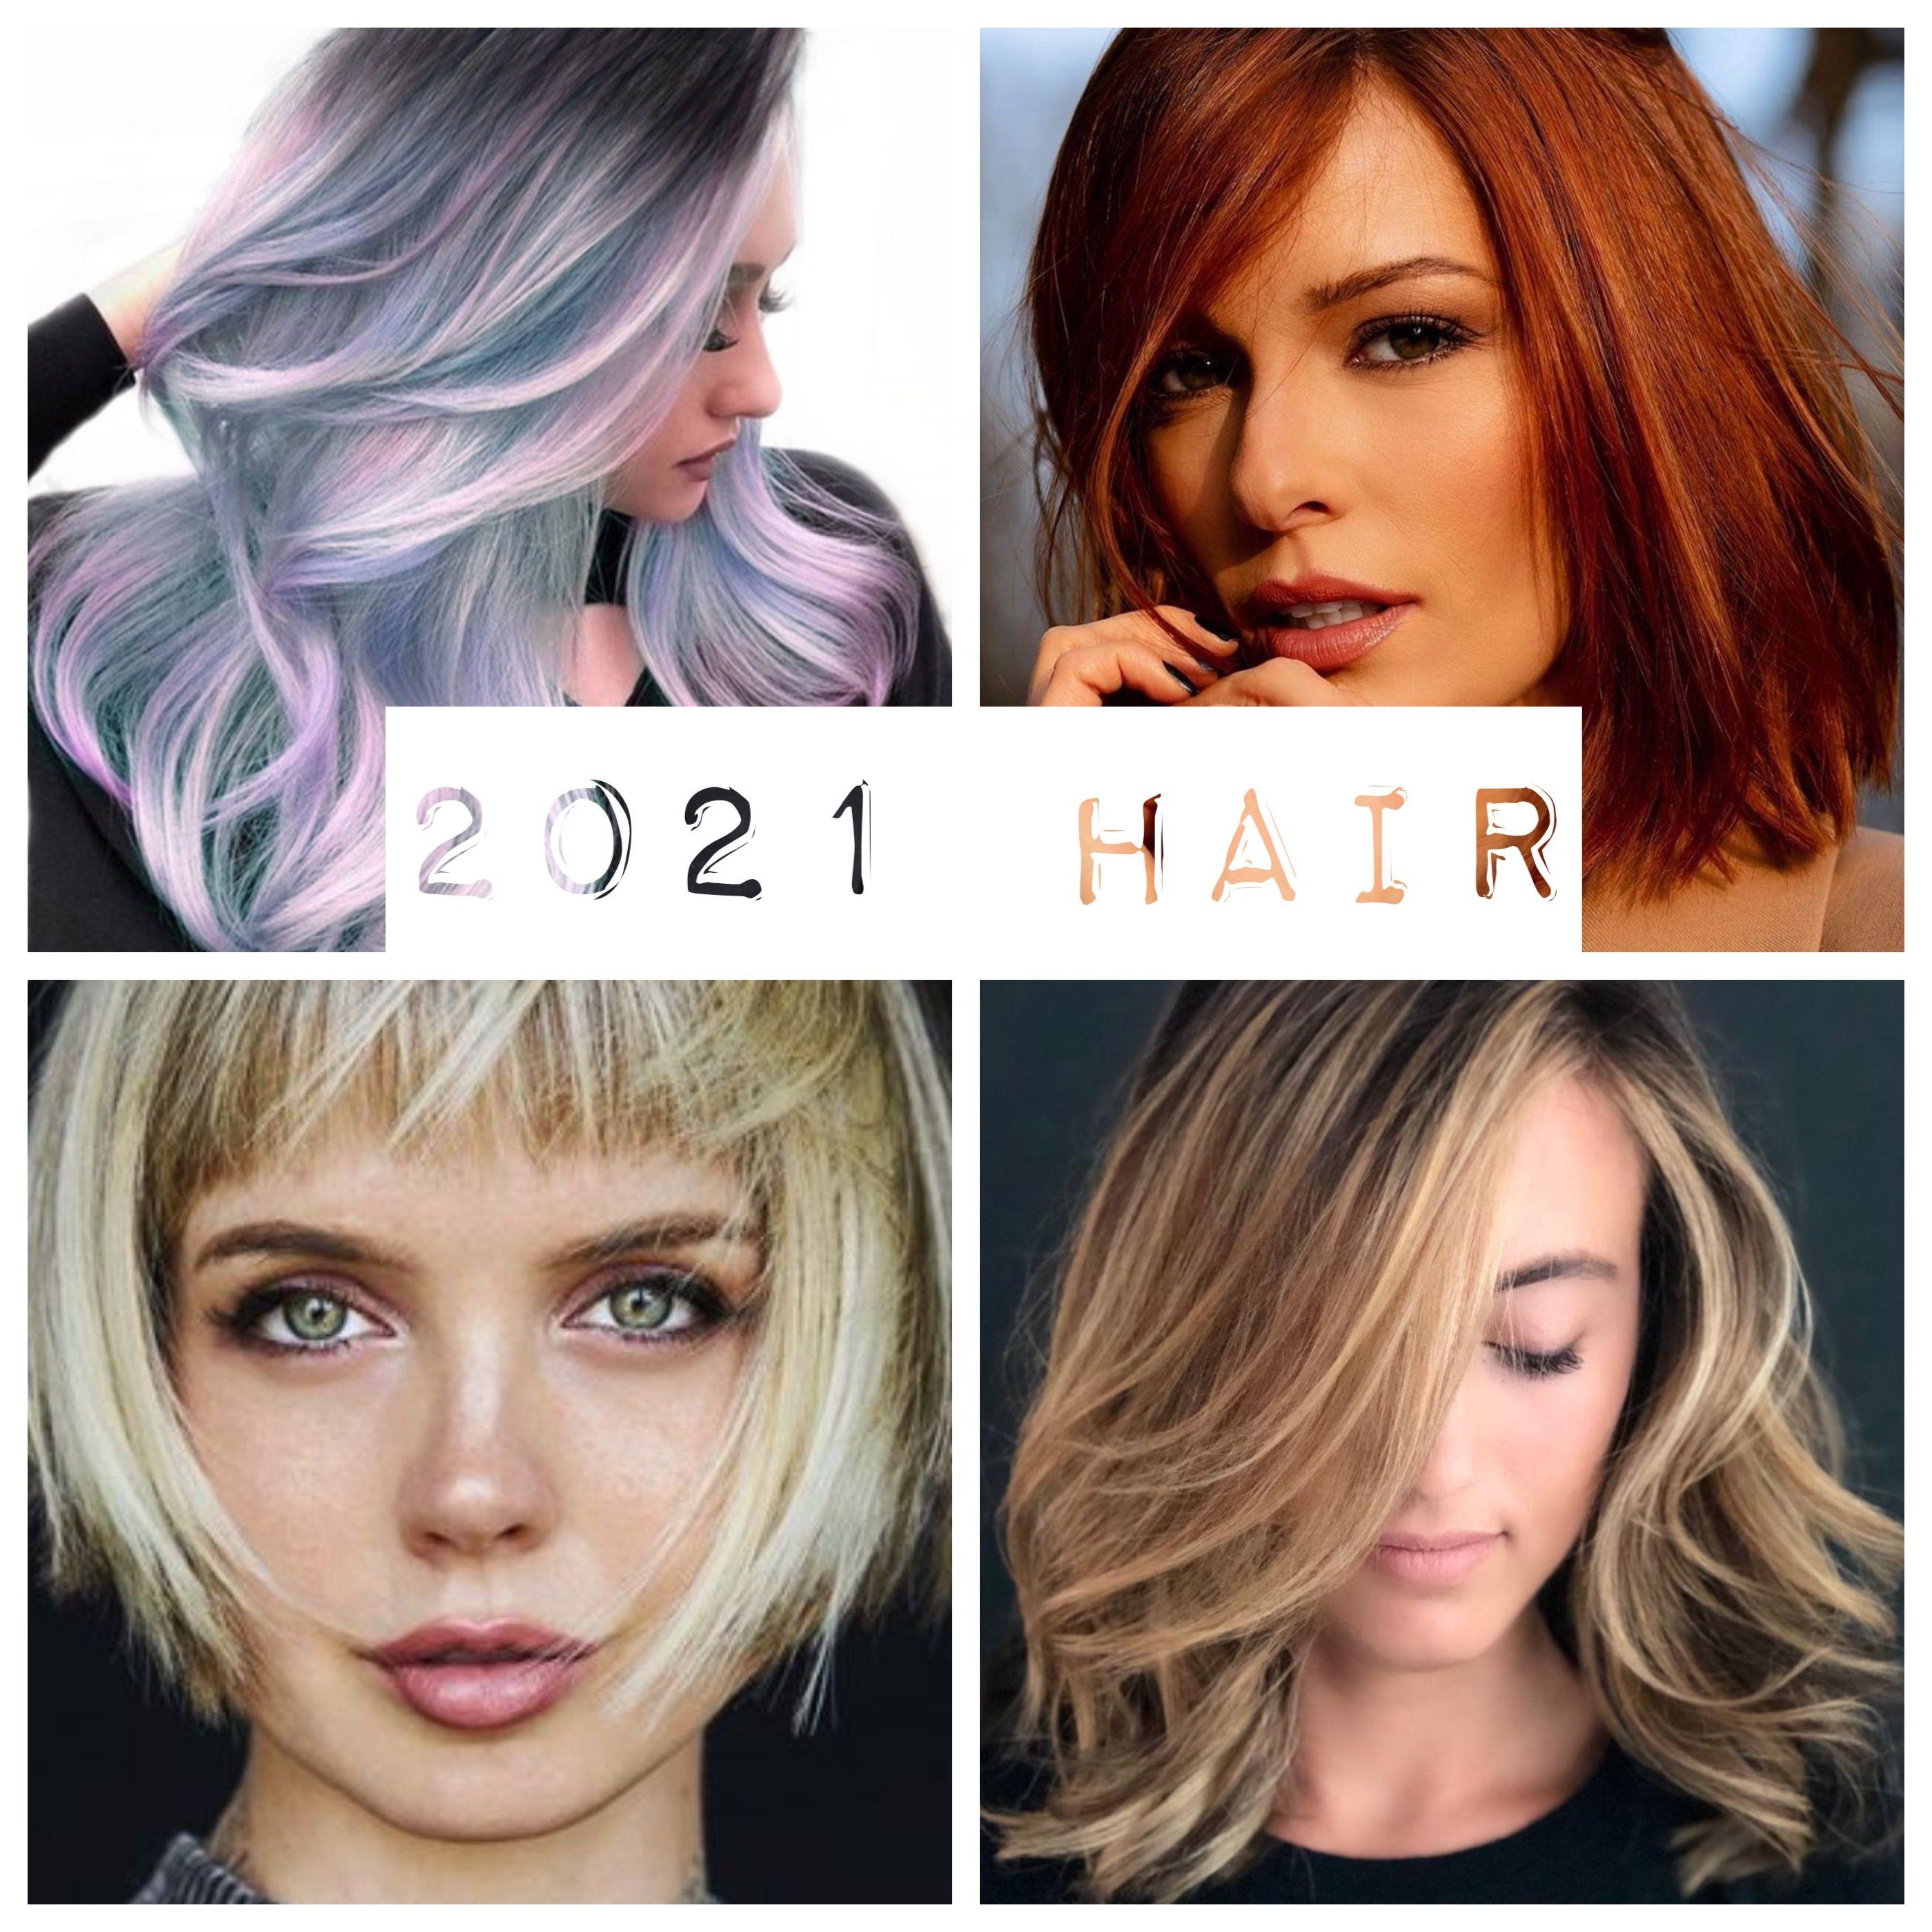 2021 Hair Celebrity Hair Colors New Hair Color Trends Hair Trends